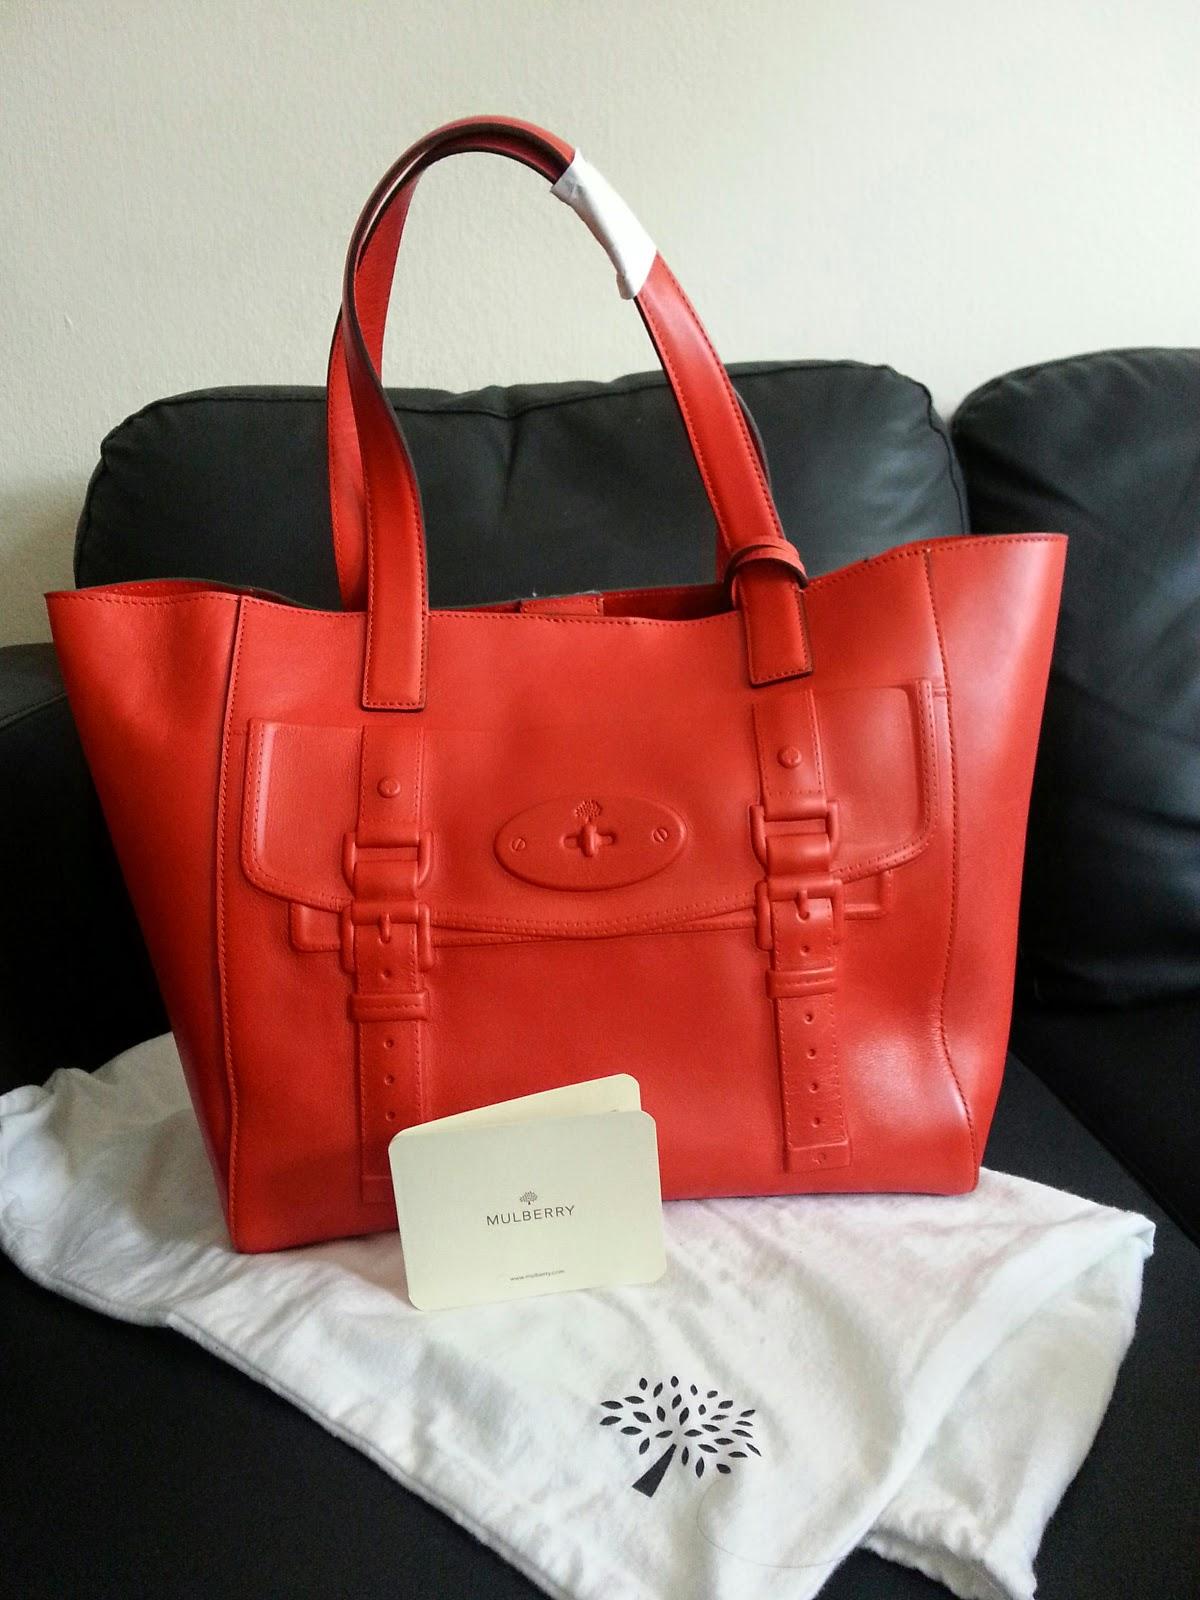 Brand New Authentic Mulberry Handbag